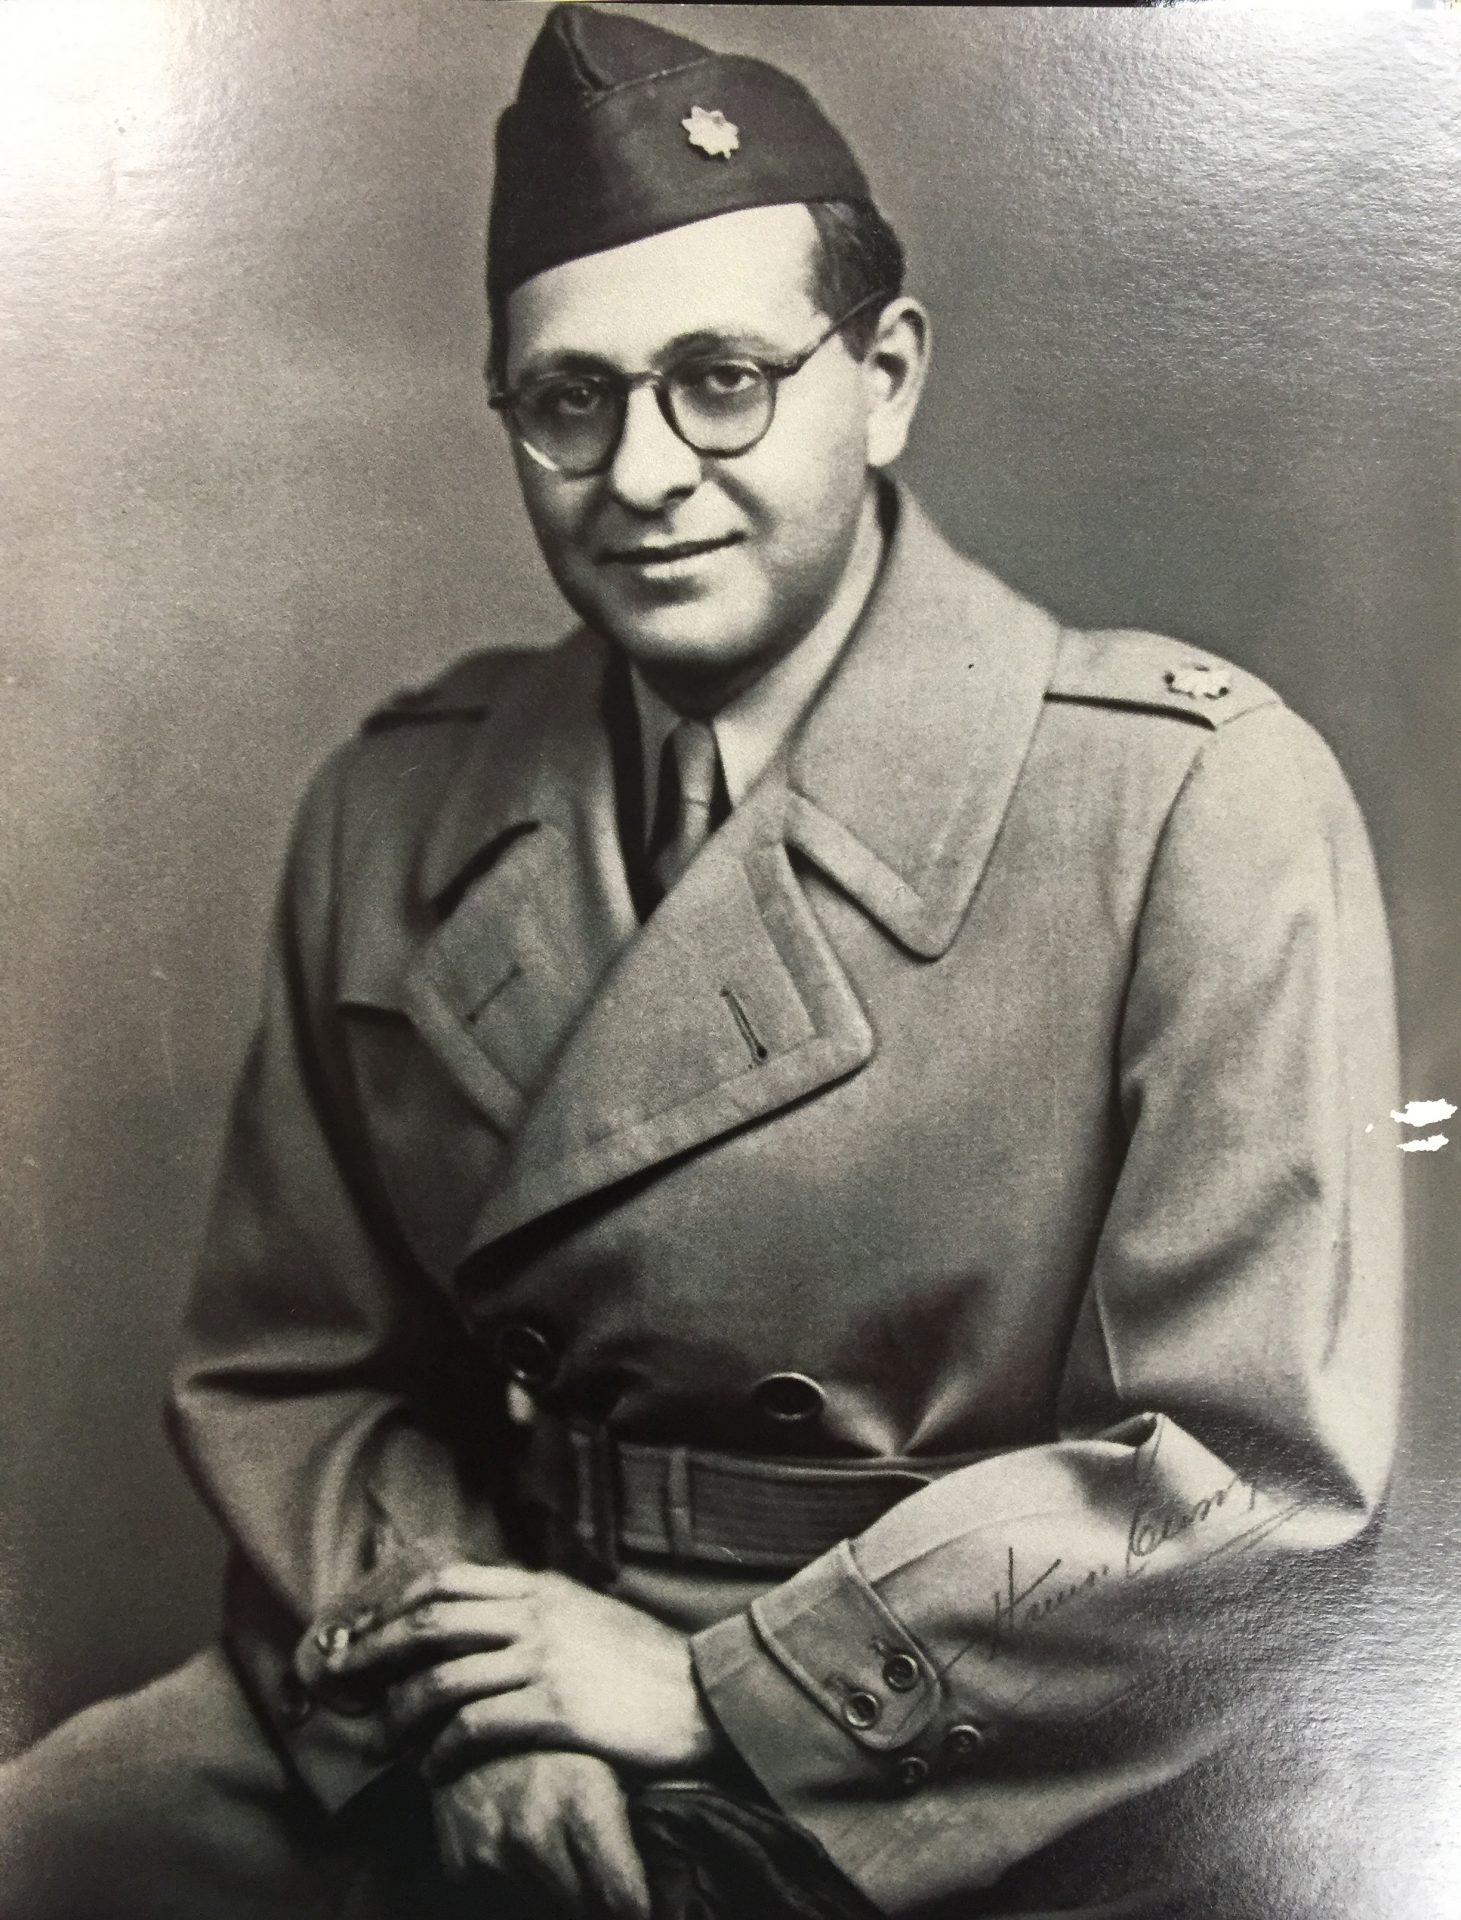 Dr Rizzoli